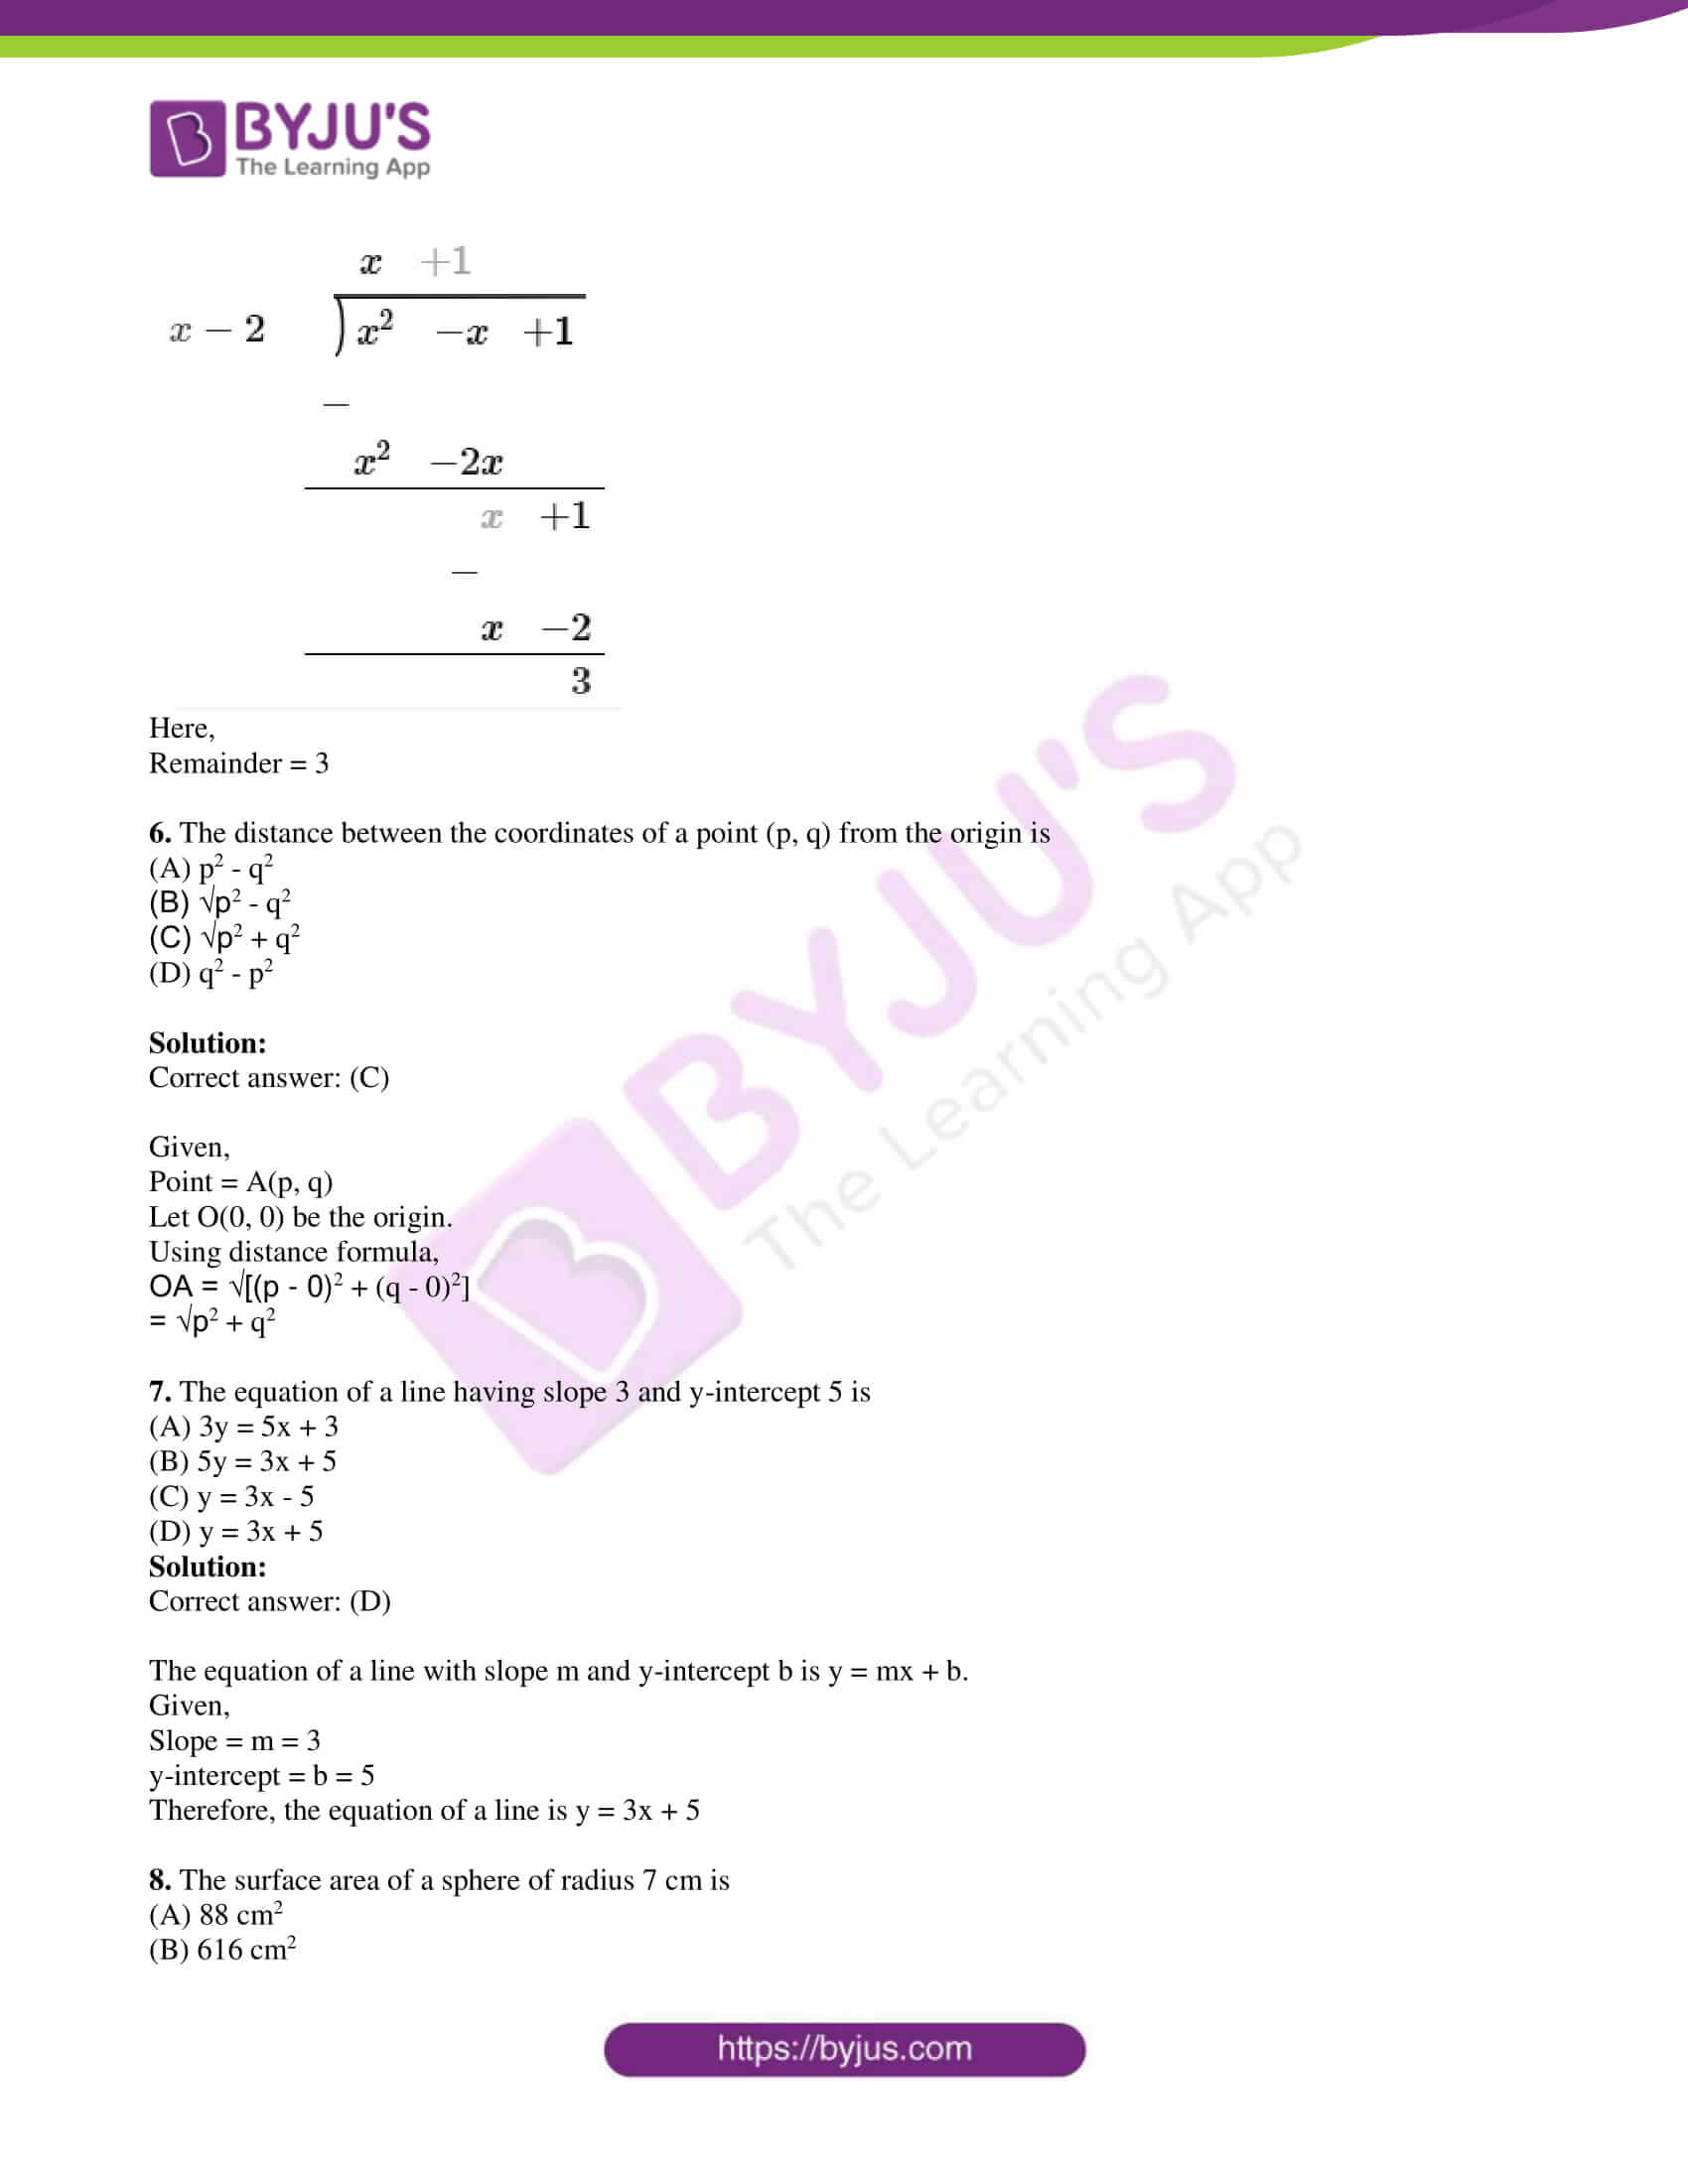 kseeb class 10 maths question paper solution 2018 03